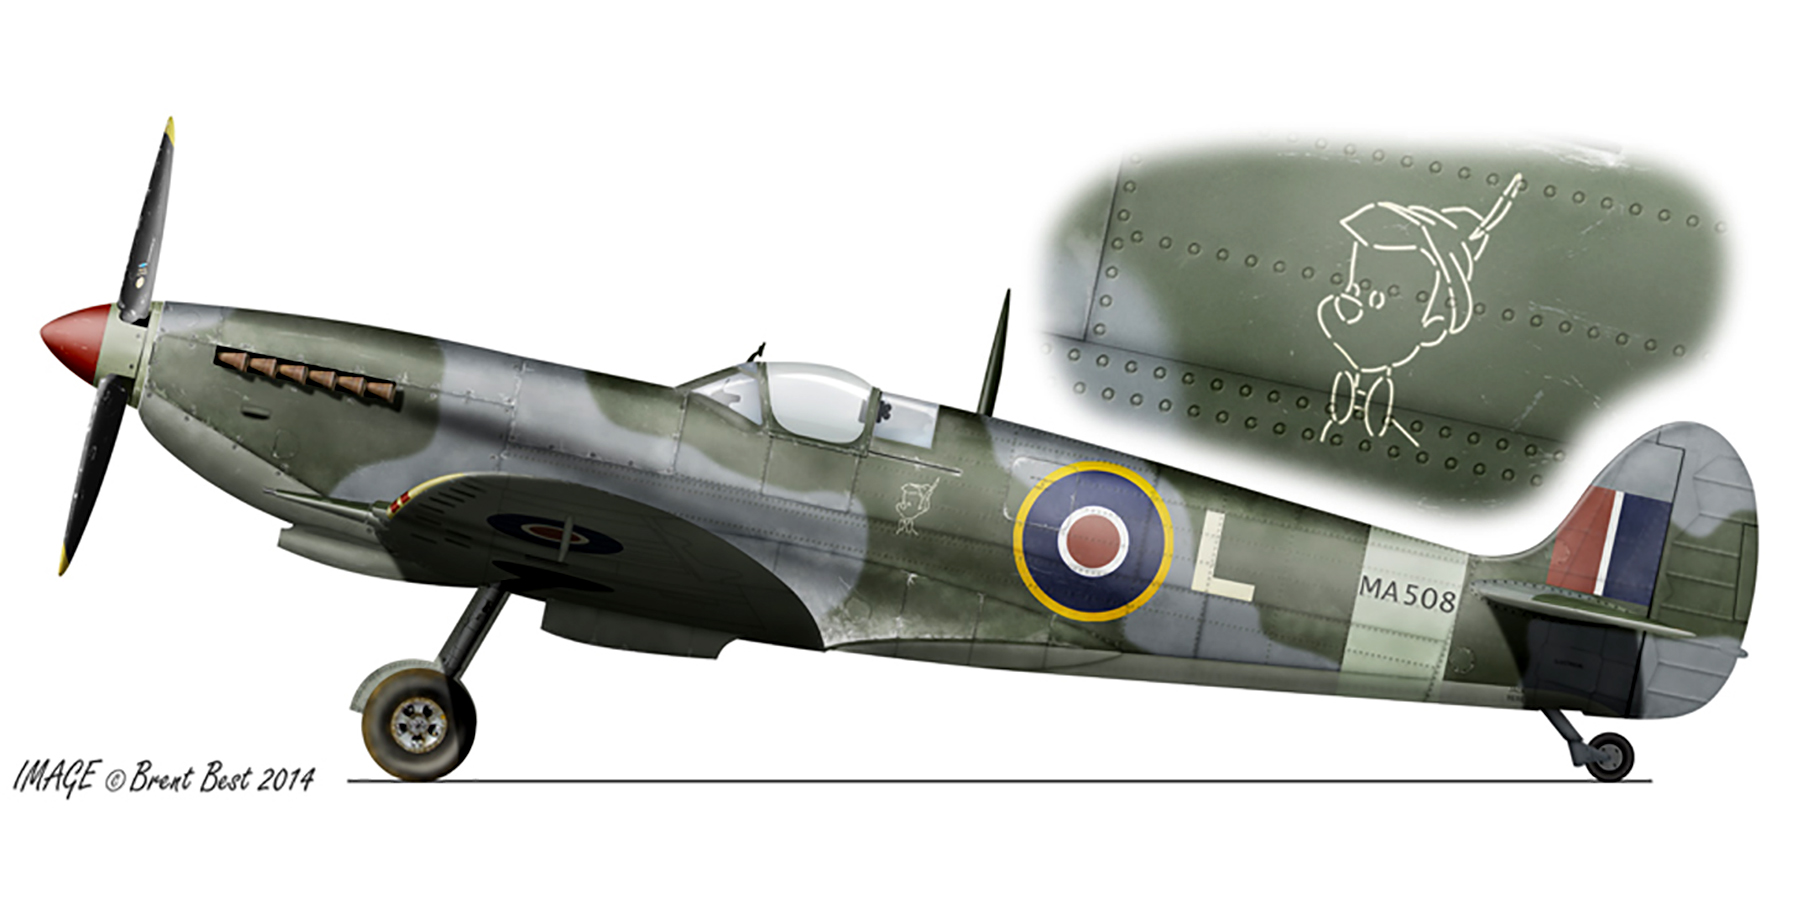 Spitfire MkIX SAAF 10Sqn L MA508 Savoia Libya Sep 1944 0A